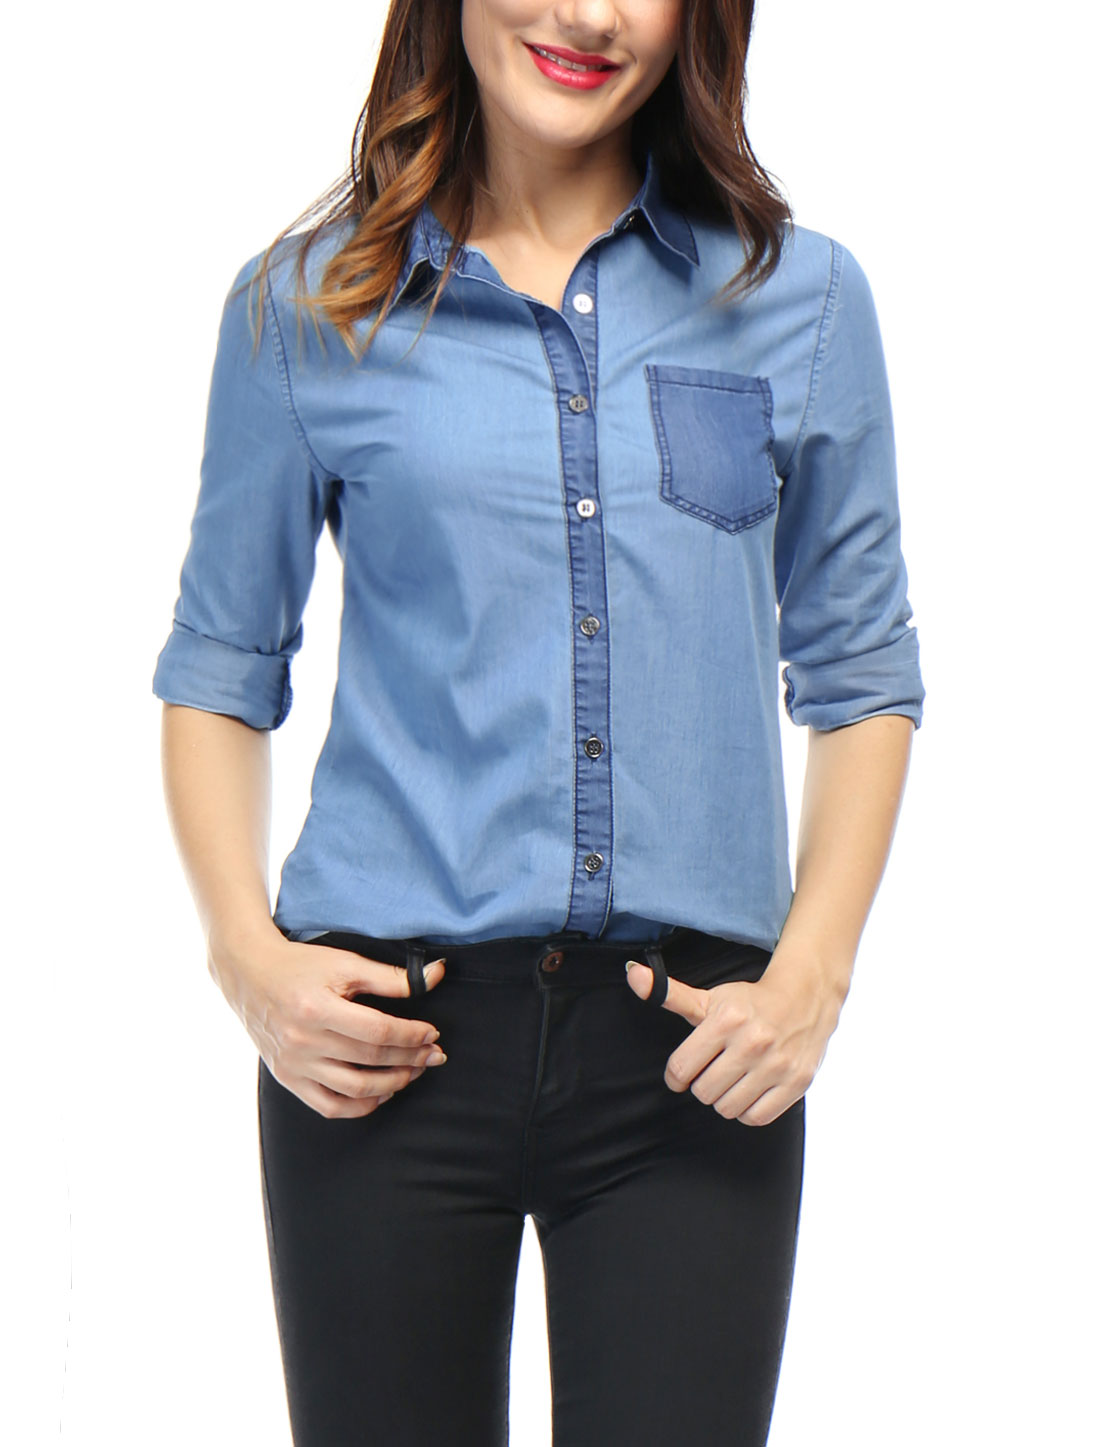 Women Color Block Long Sleeves Button Down Shirt Blue S